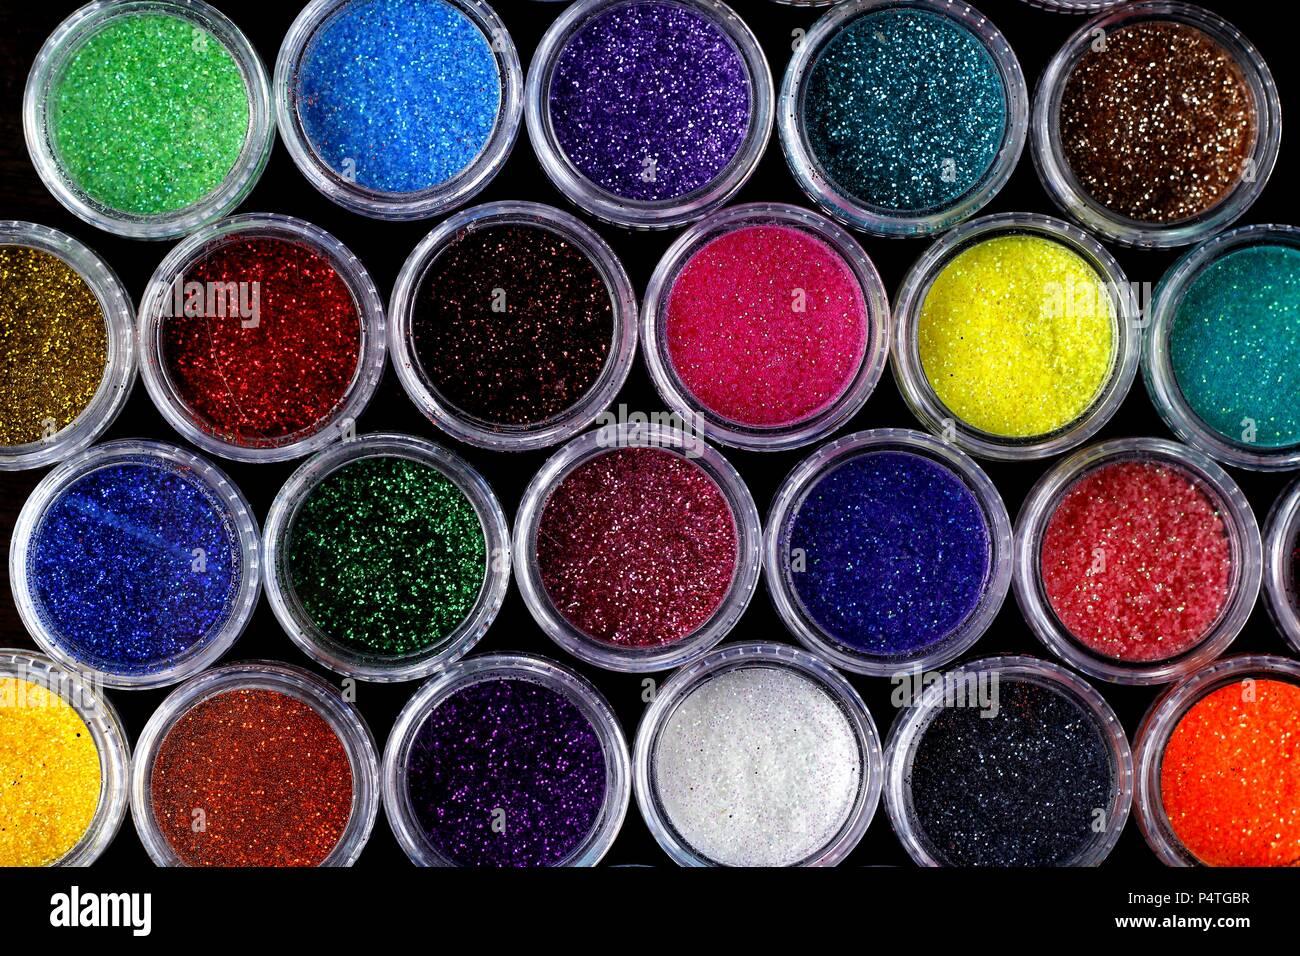 Photo of assorted colorful nail polish glitters Stock Photo